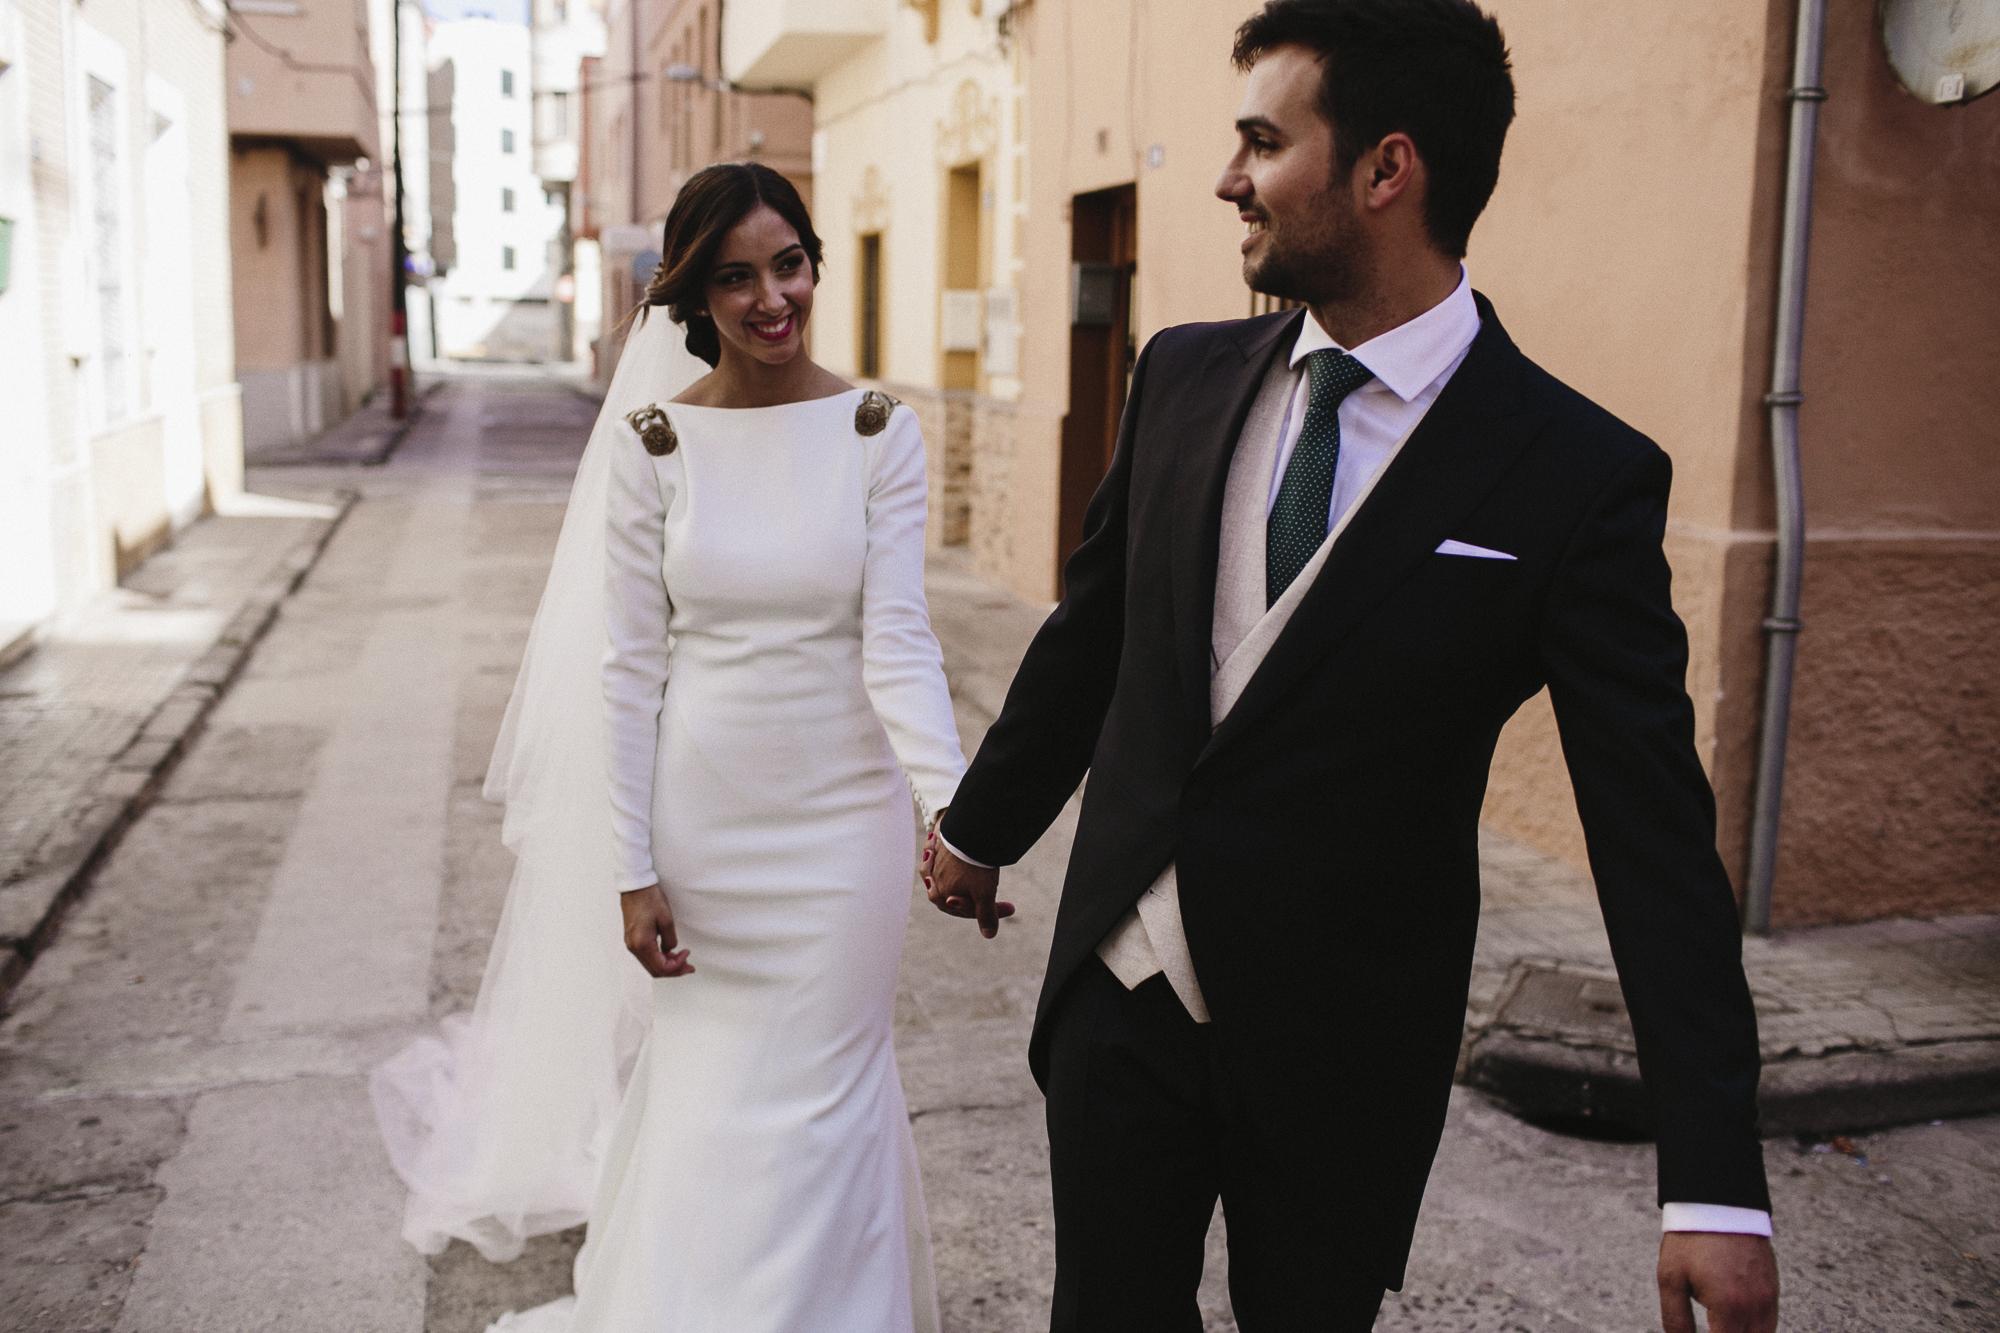 alfonso_flores_destination_wedding_photogrpaher_españa-82.jpg